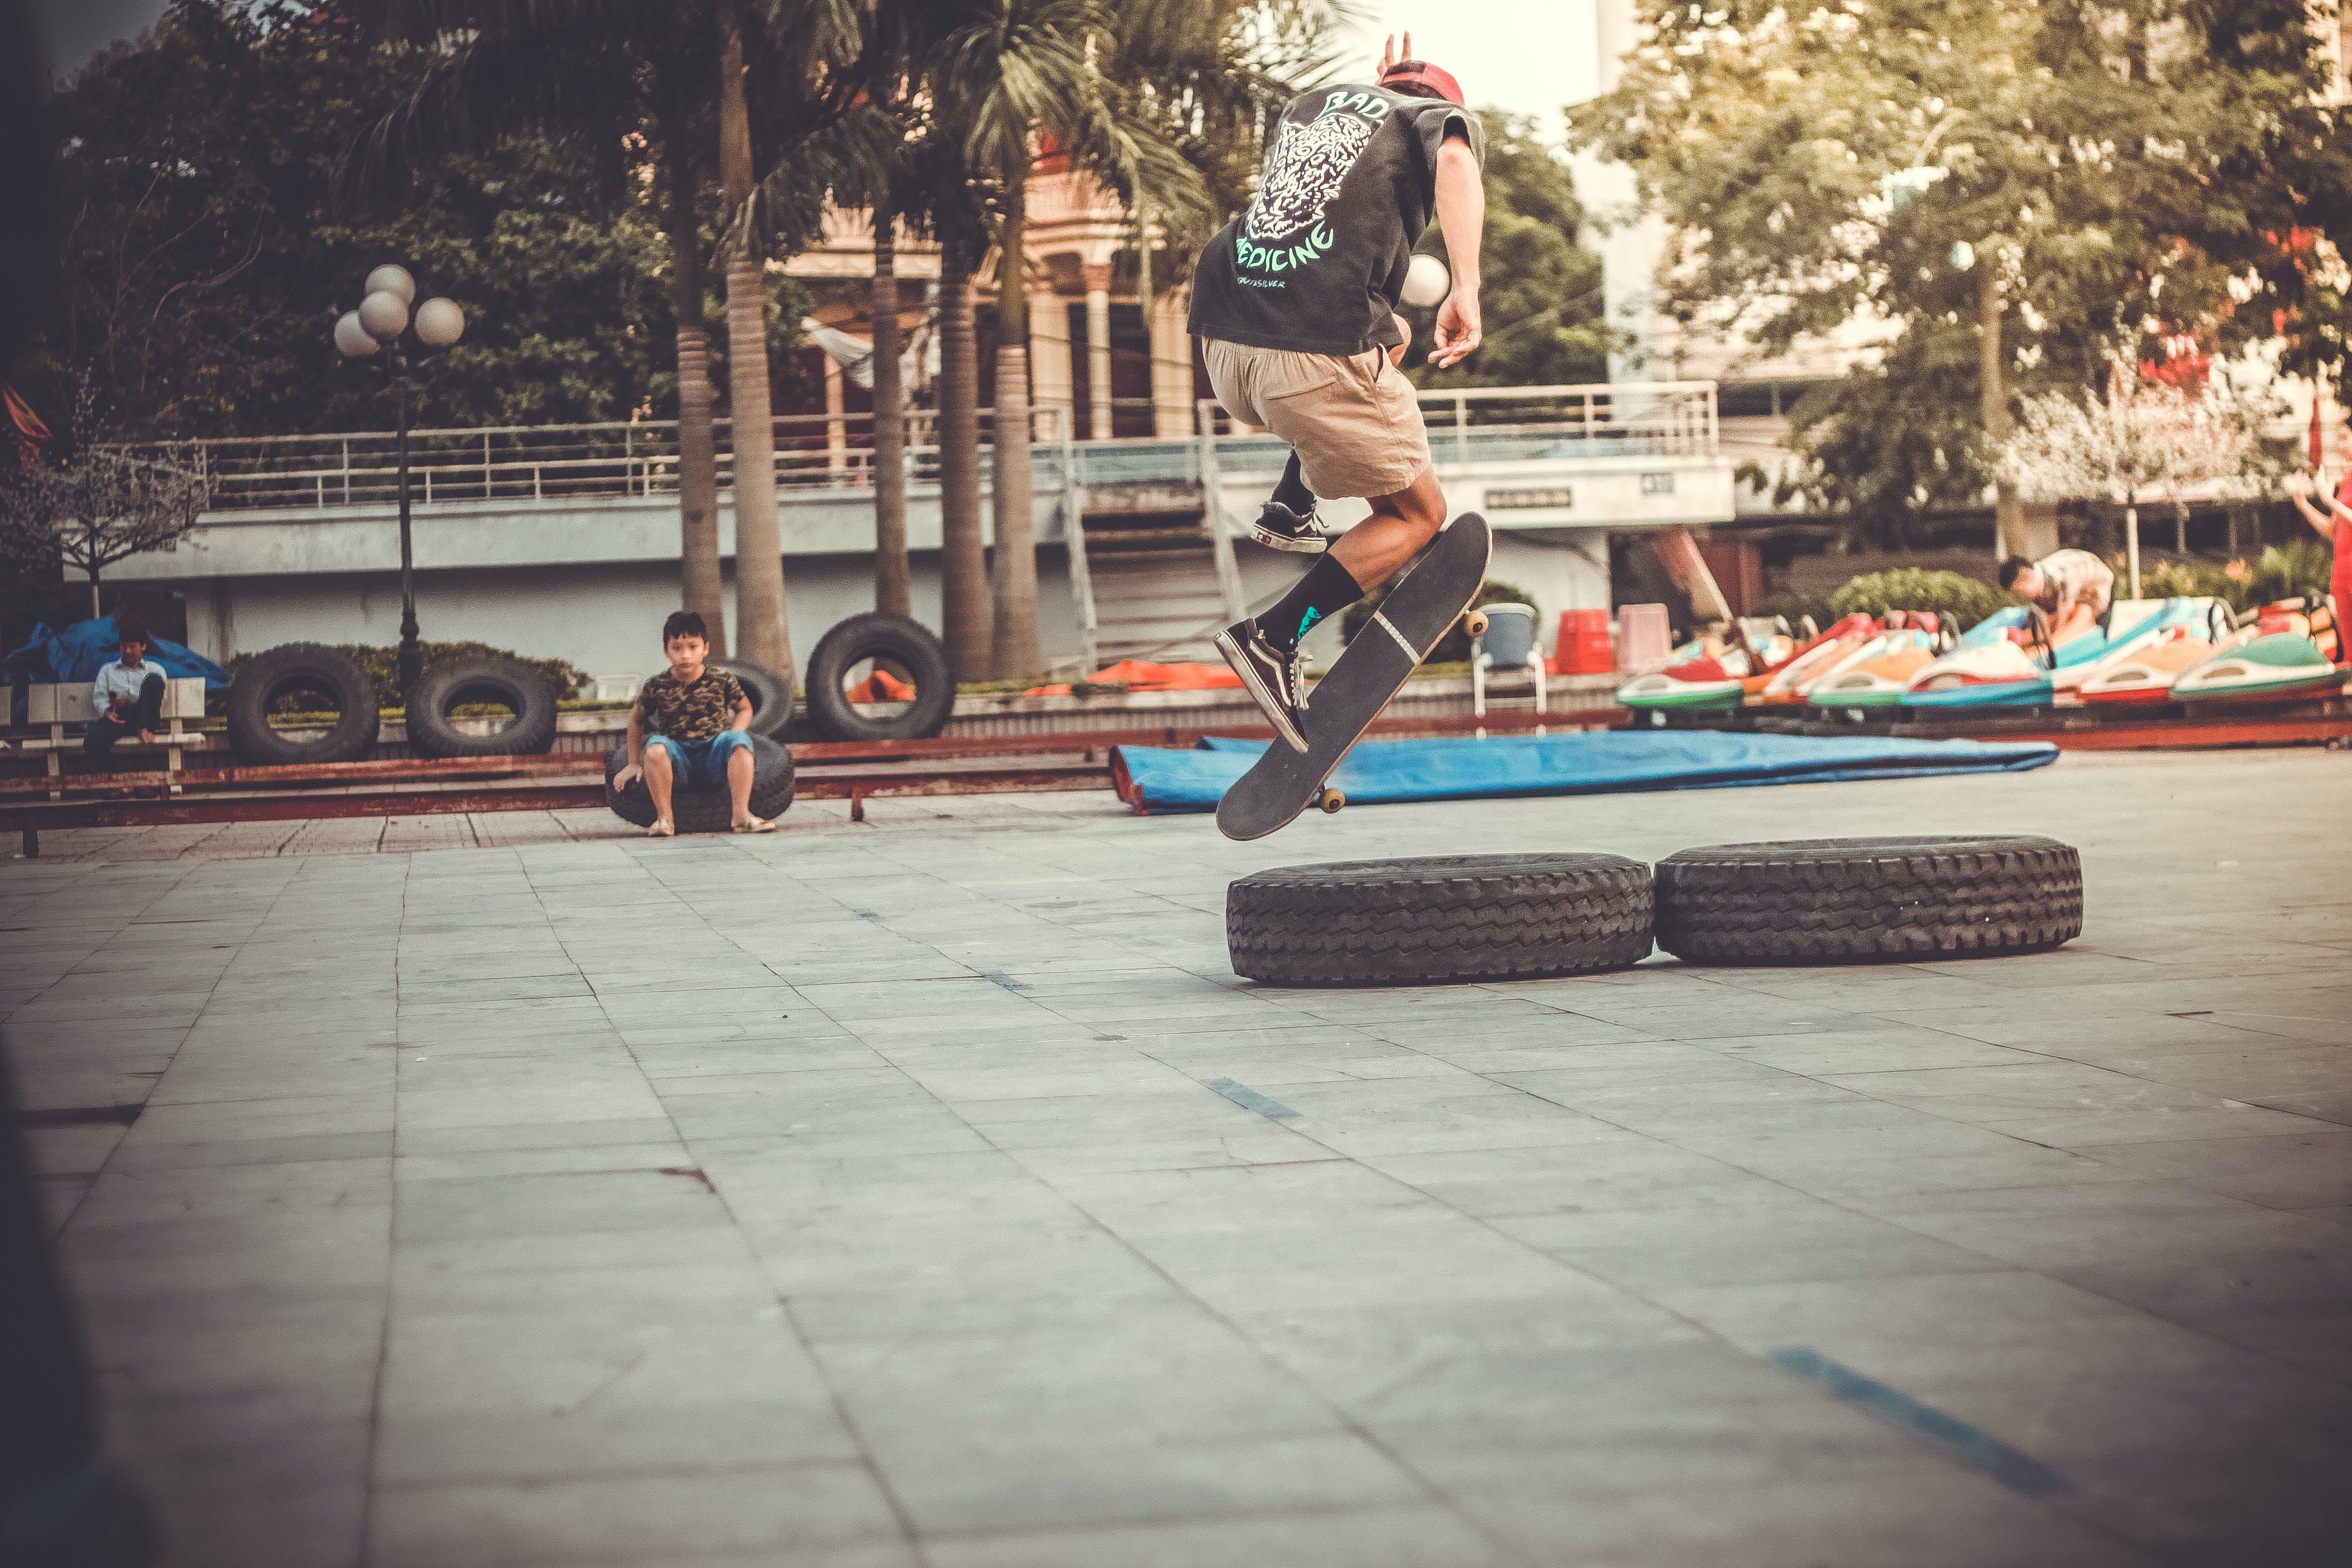 Man Playing Skateboard on Skate Park